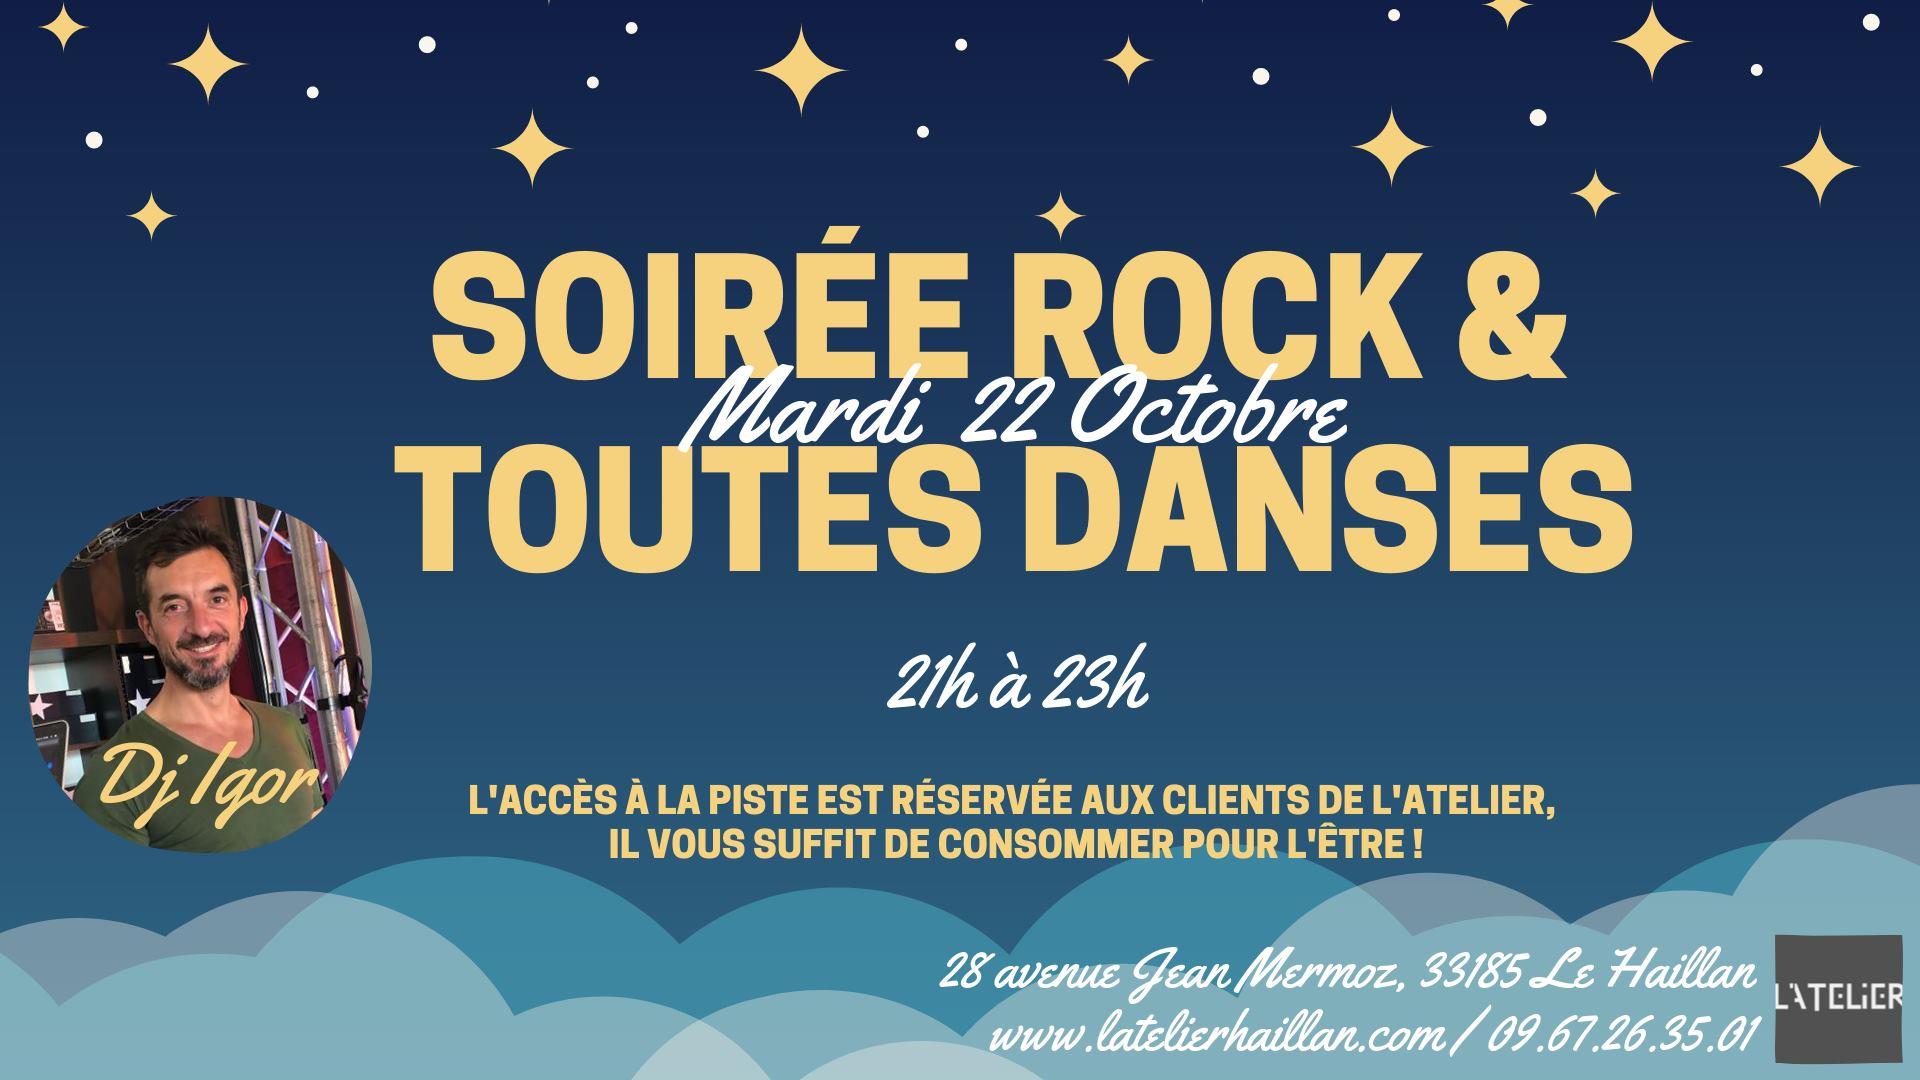 Les Mardis Rock & Toutes Danses avec Dj Igor